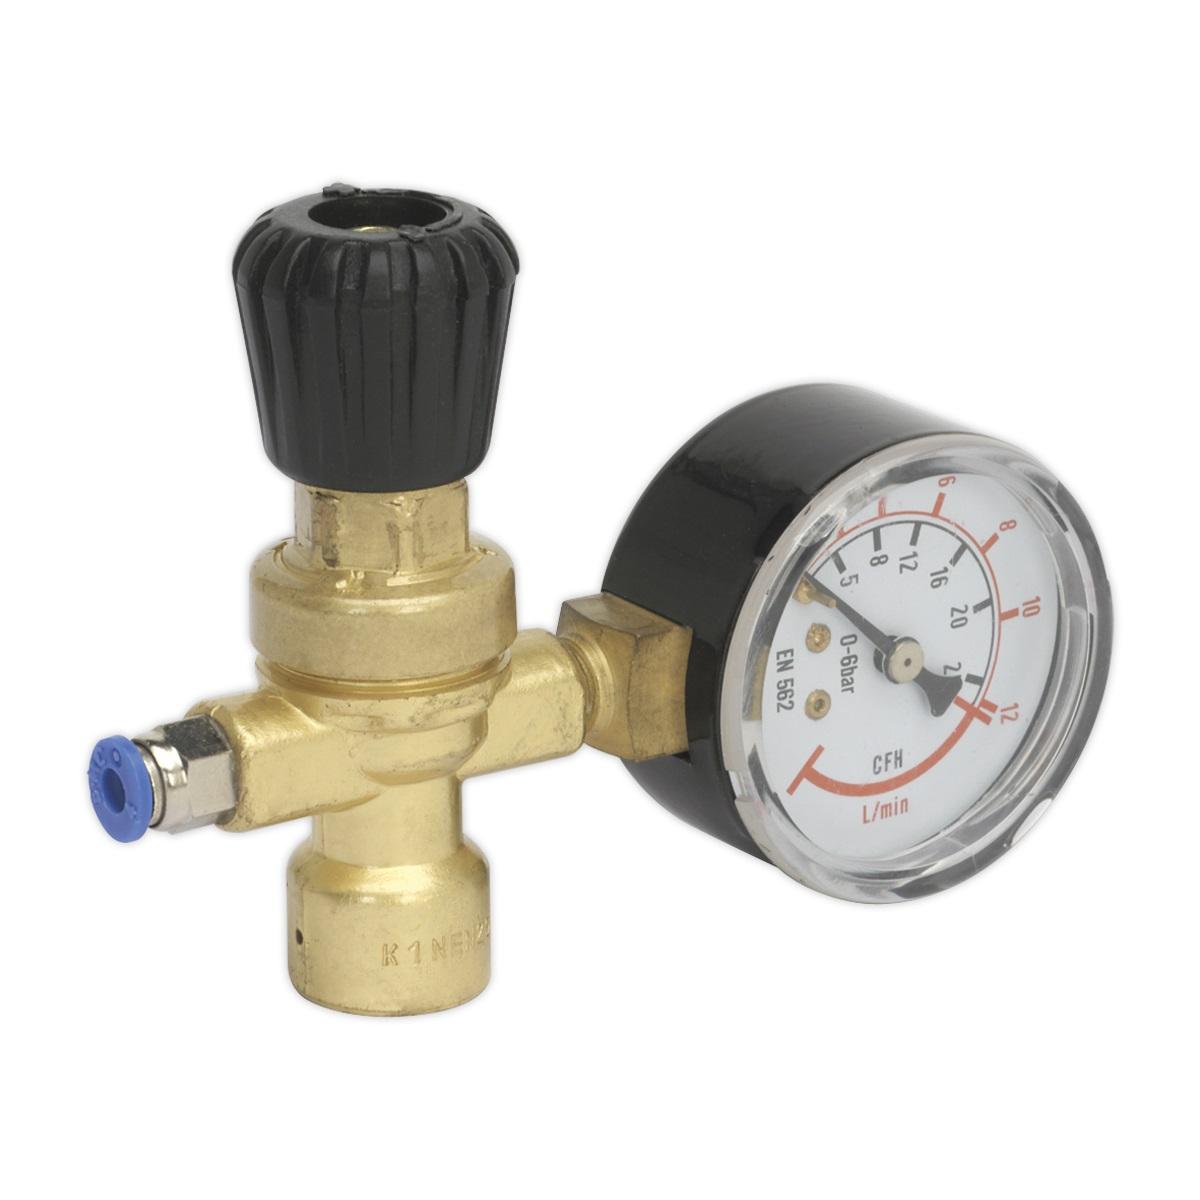 Sealey MIG Gas Regulator Disposable Cylinder 1 Gauge REG/MMG   Industrial regulators fit CO2, Argon and CO2/Argon mix mini refillable/disposable gas cylinders.   toolforce.ie